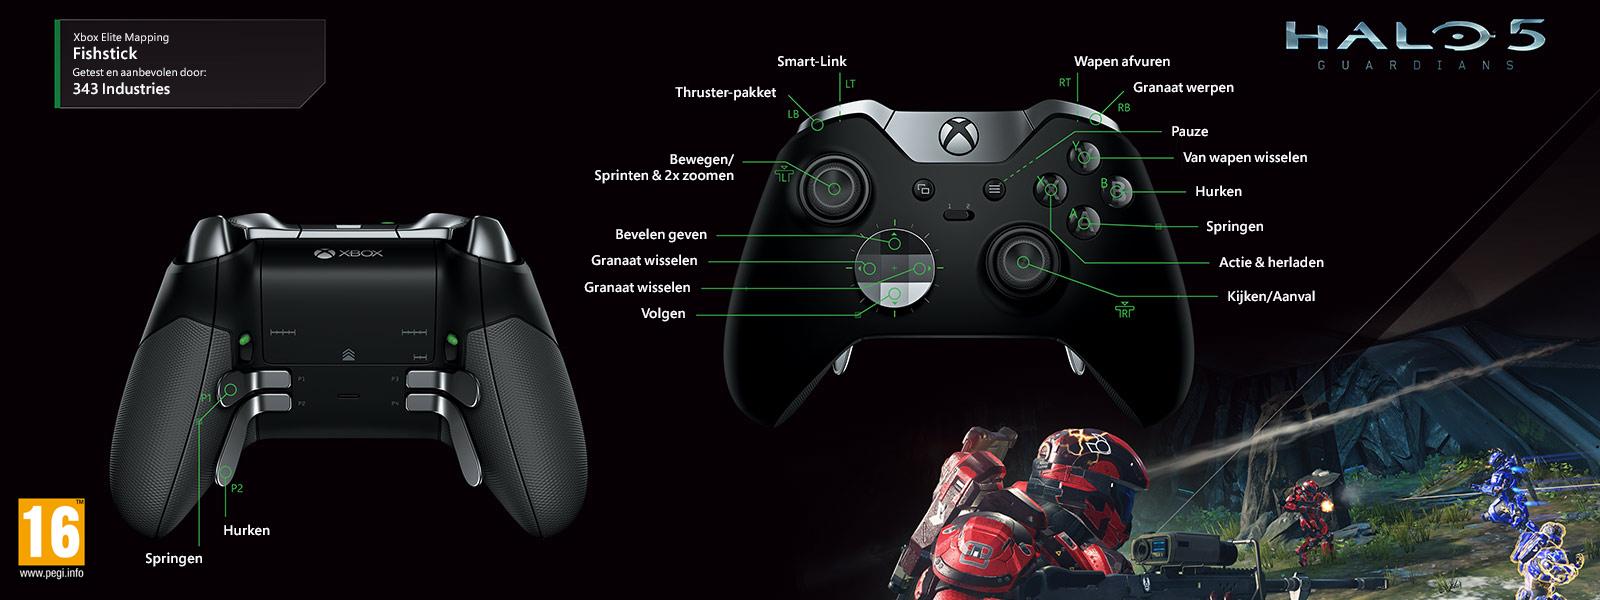 Halo 5 - Elite-mapping voor fishstick